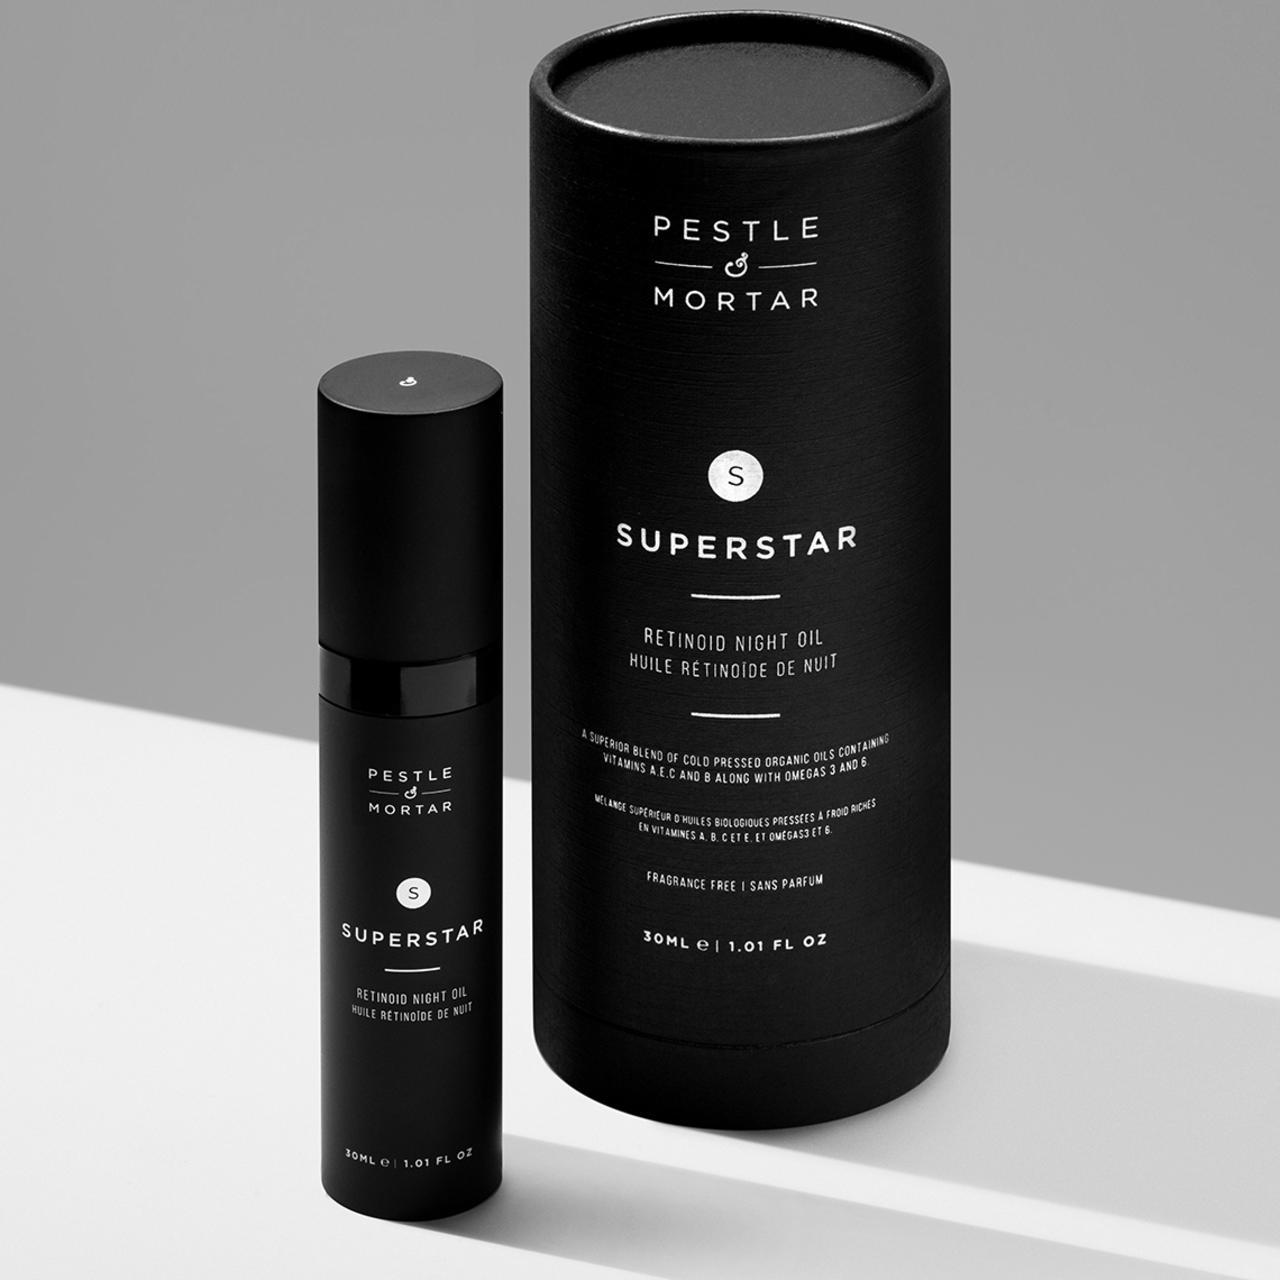 Pestle & Mortar Superstar Retinoid Night Oil, 12.990 kr. Fæst …